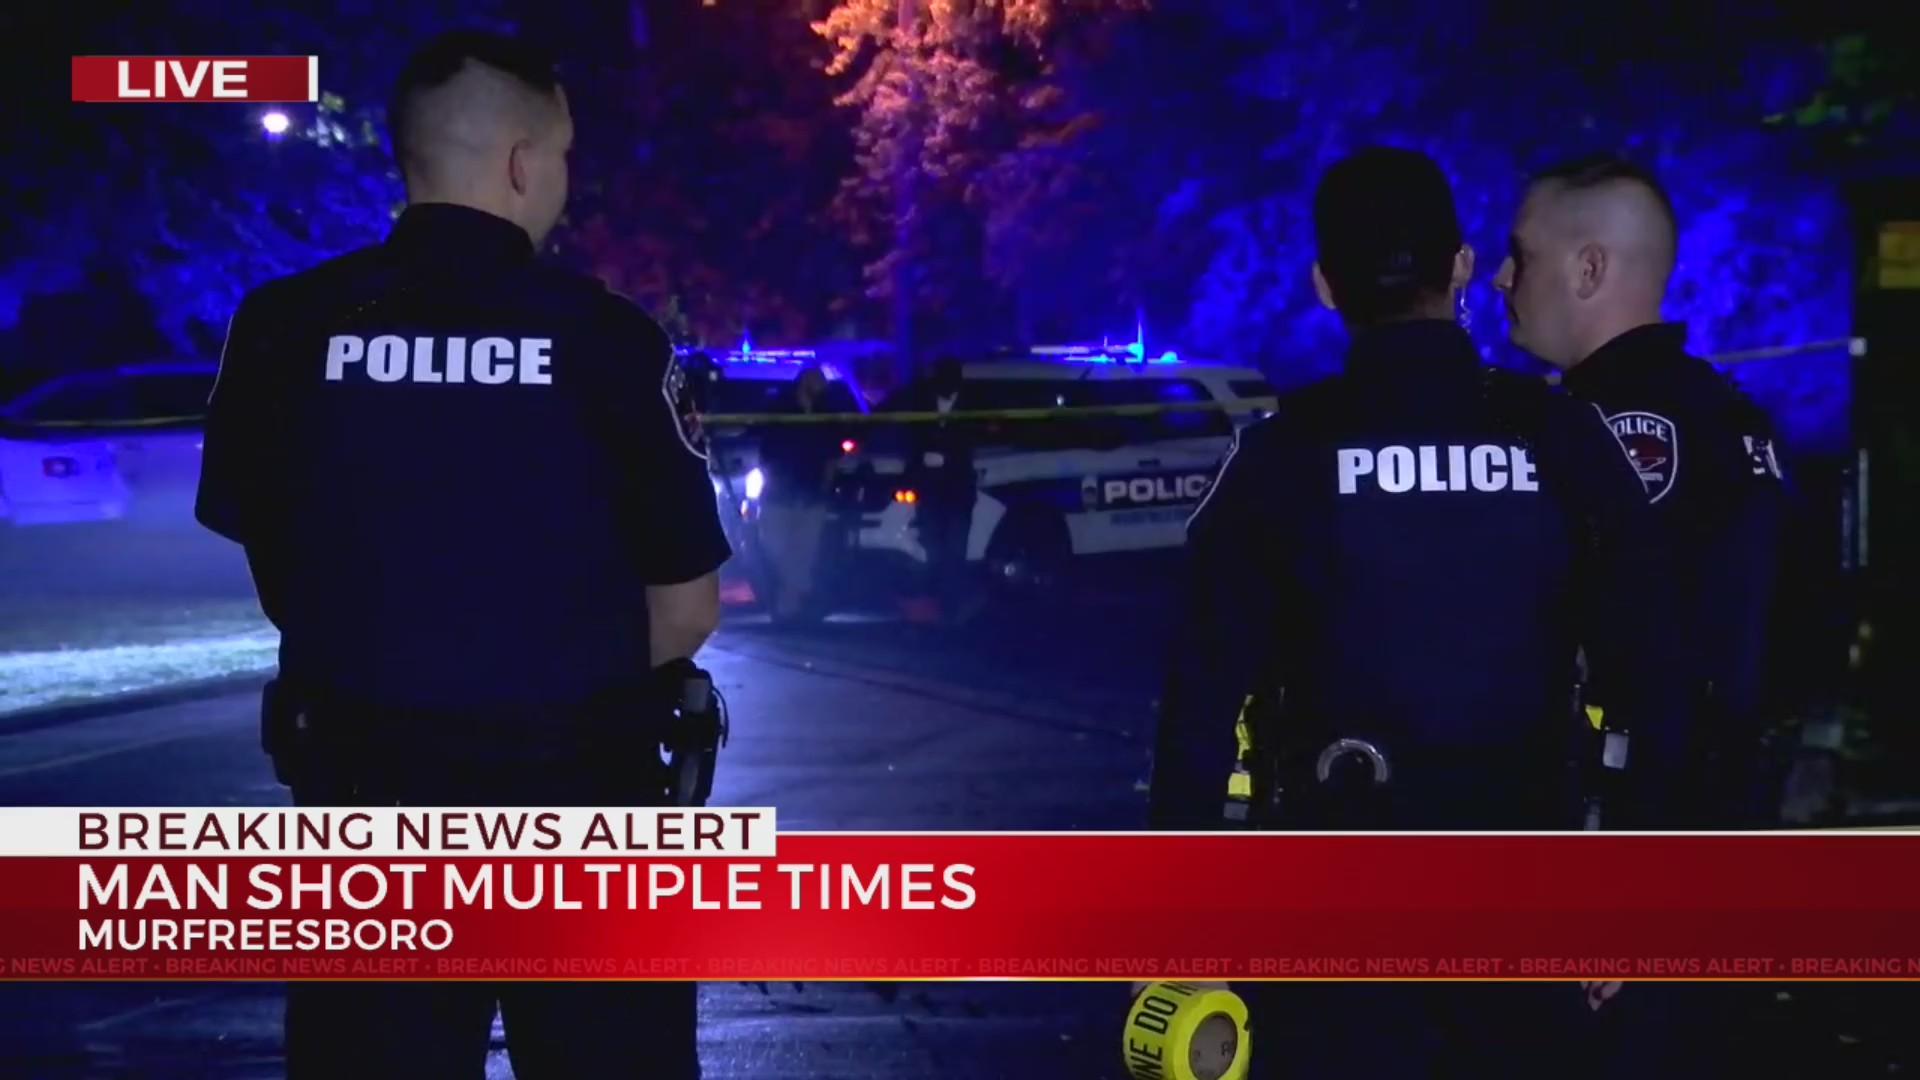 Man killed in shooting at Murfreesboro condo complex | WKRN